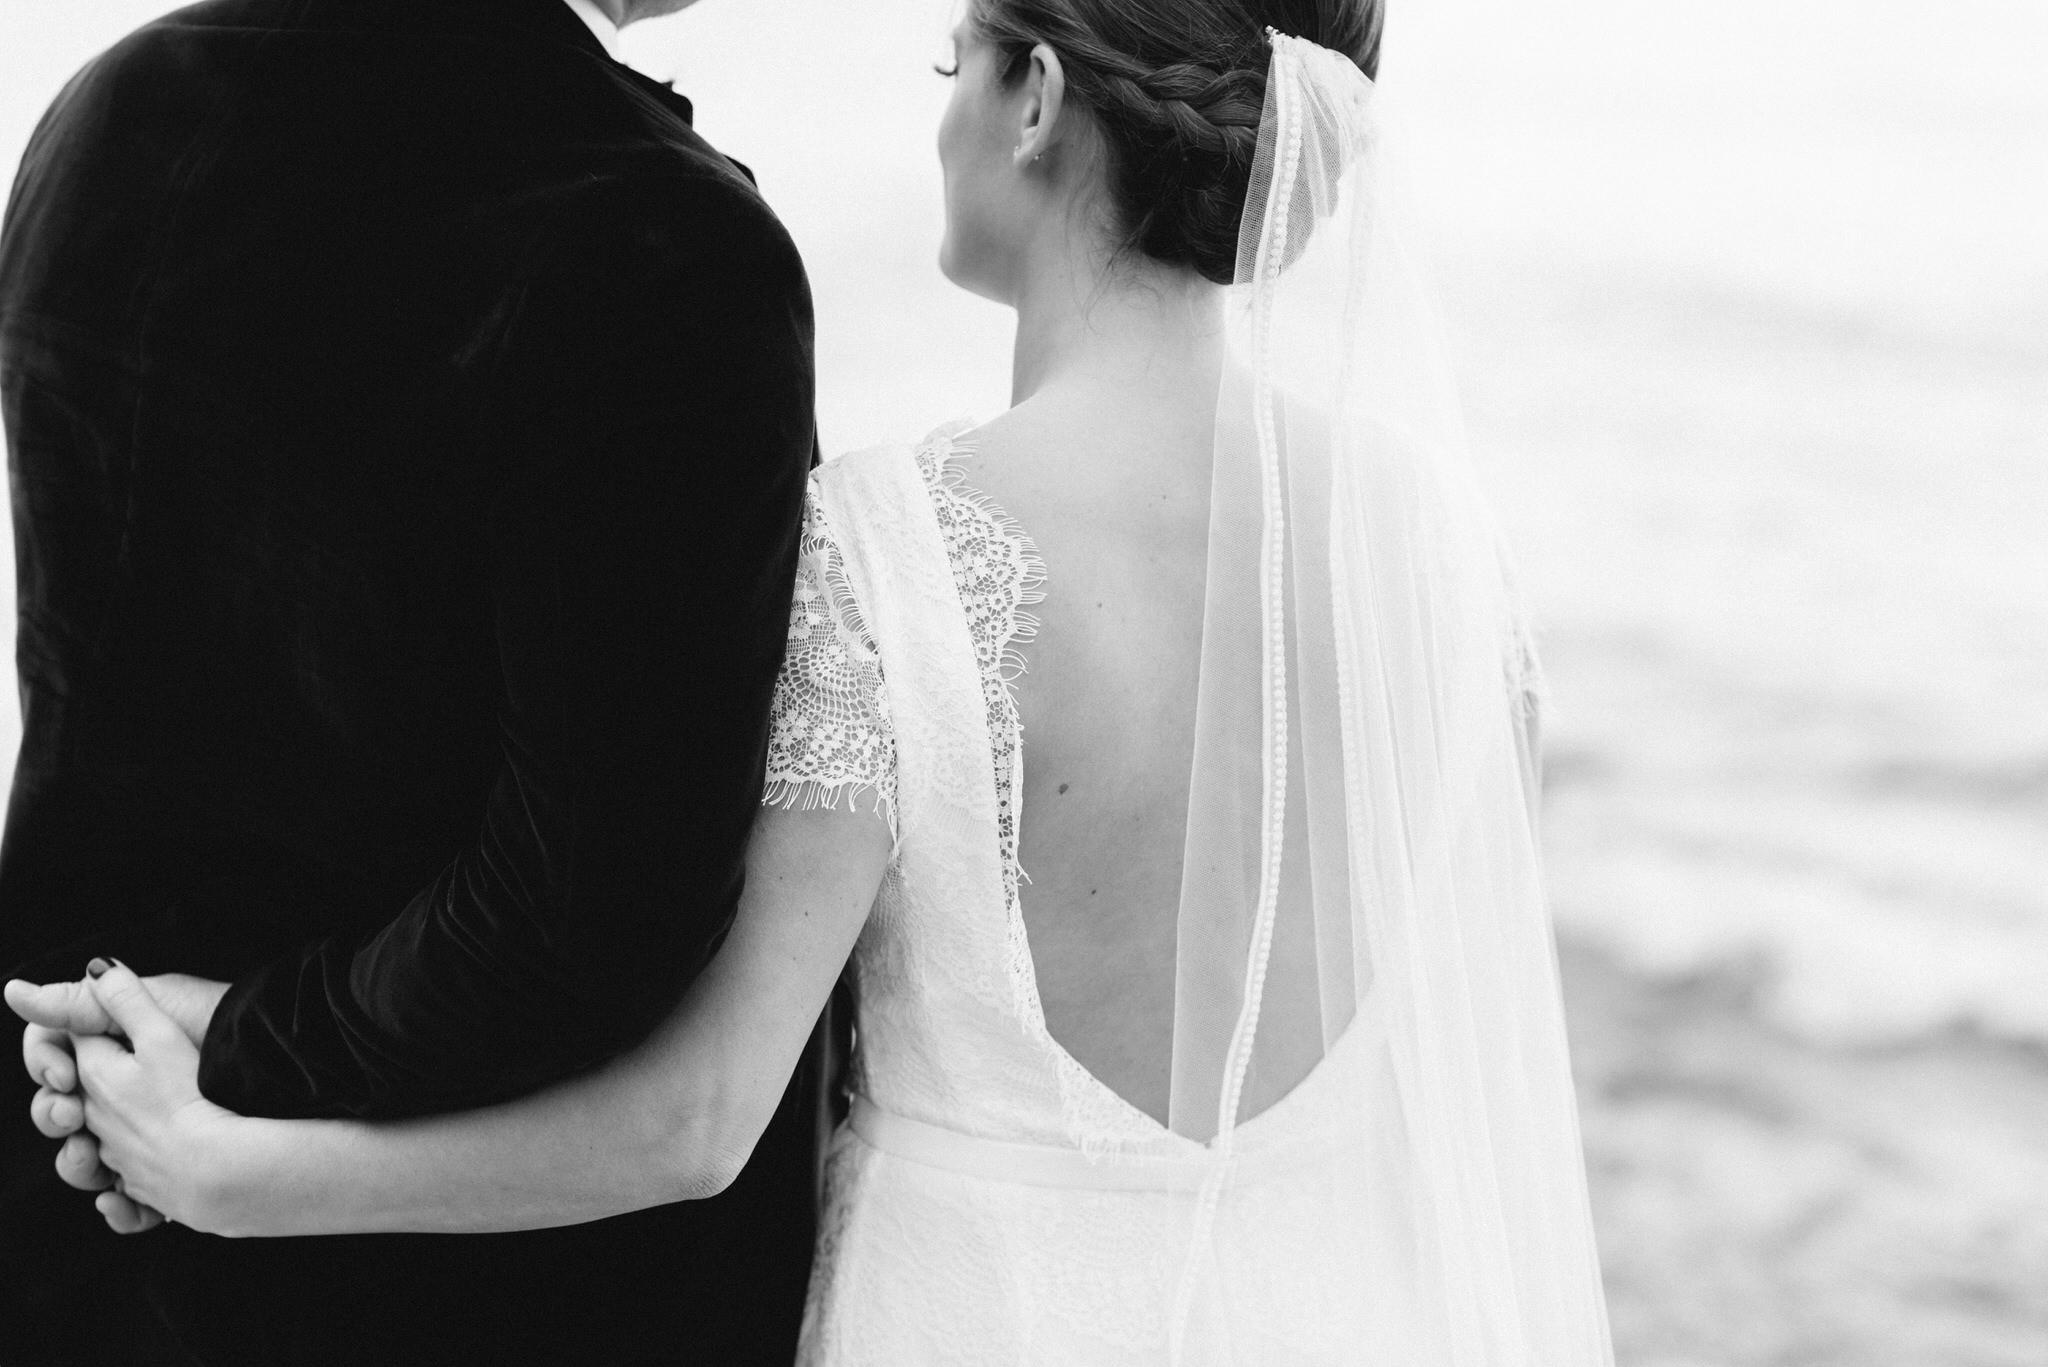 scarletoneillphotography_weddingphotography_prince edward county weddings040.JPG